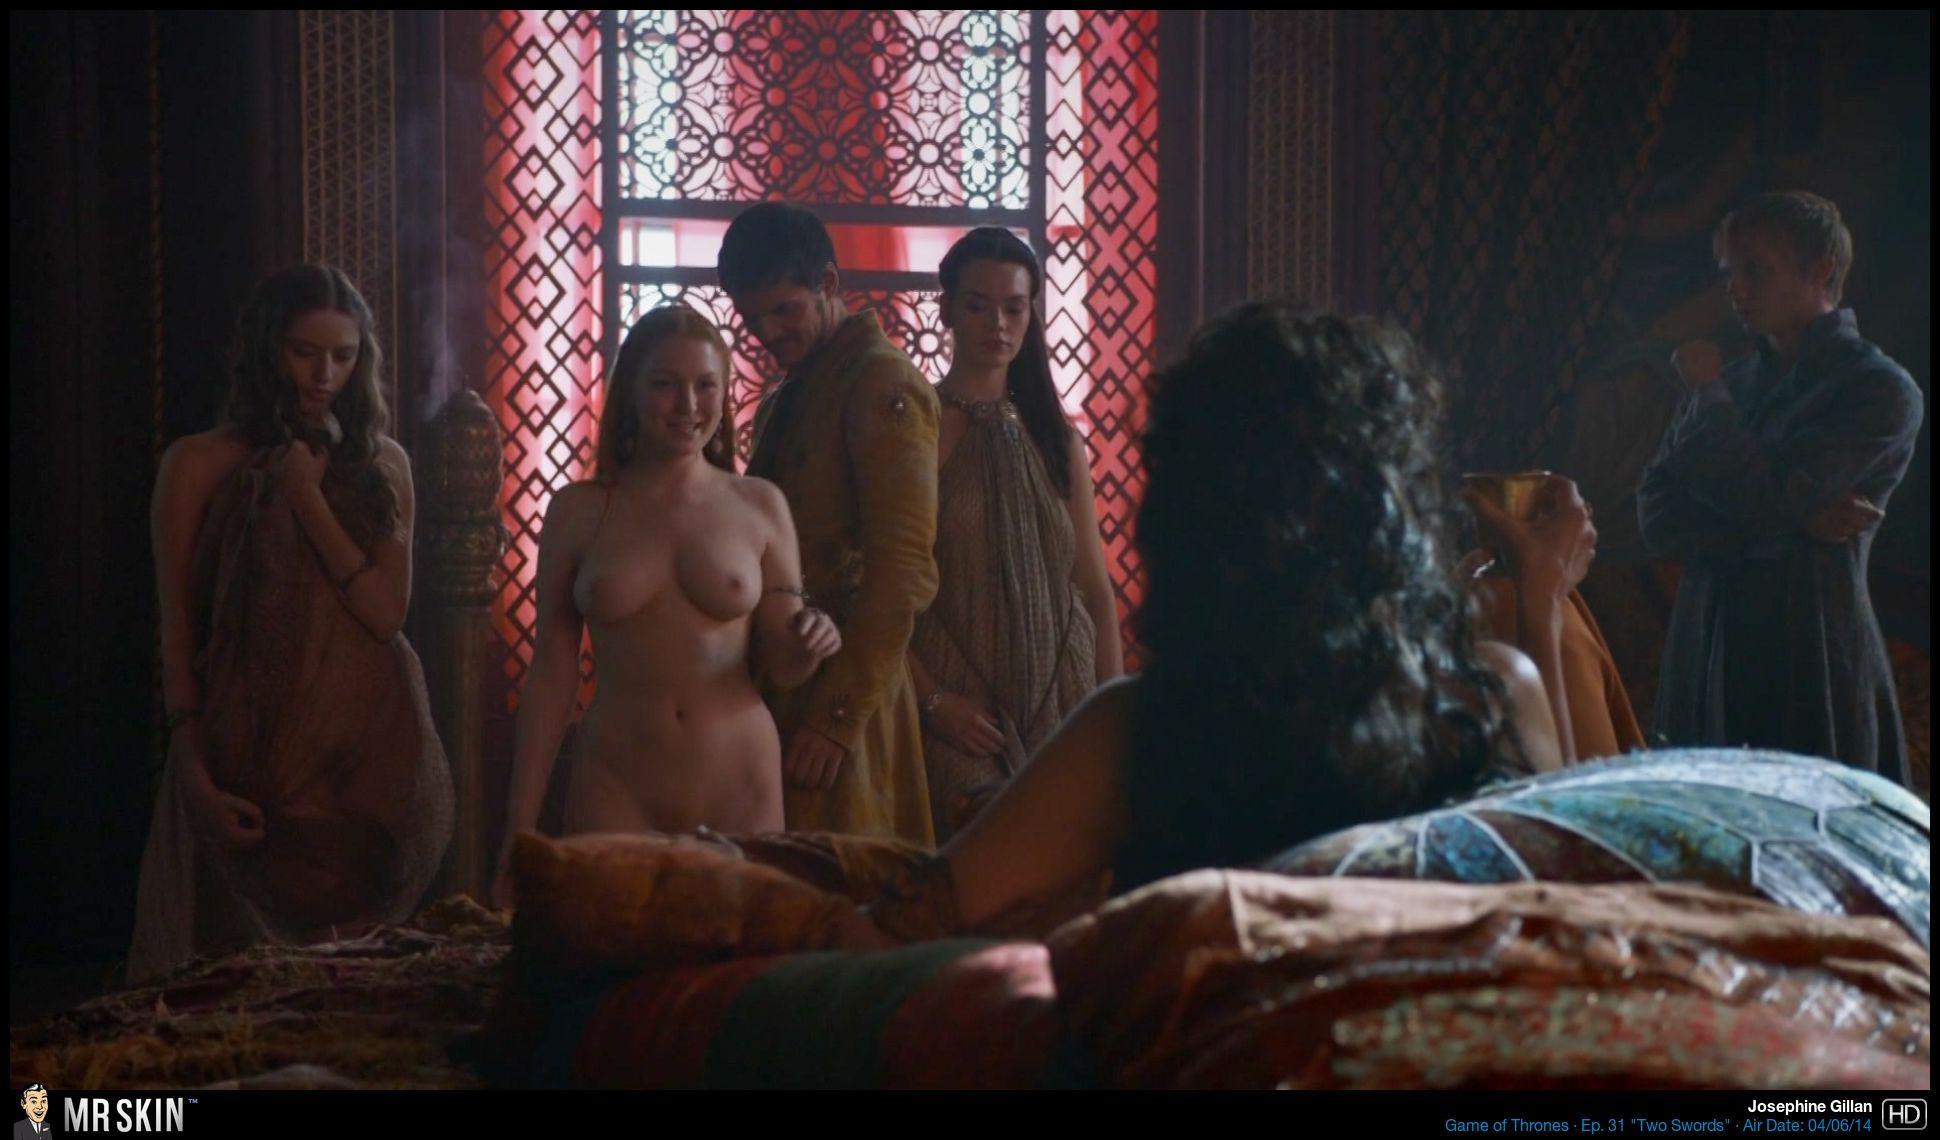 prostitutas almendralejo escena prostitutas juego de tronos